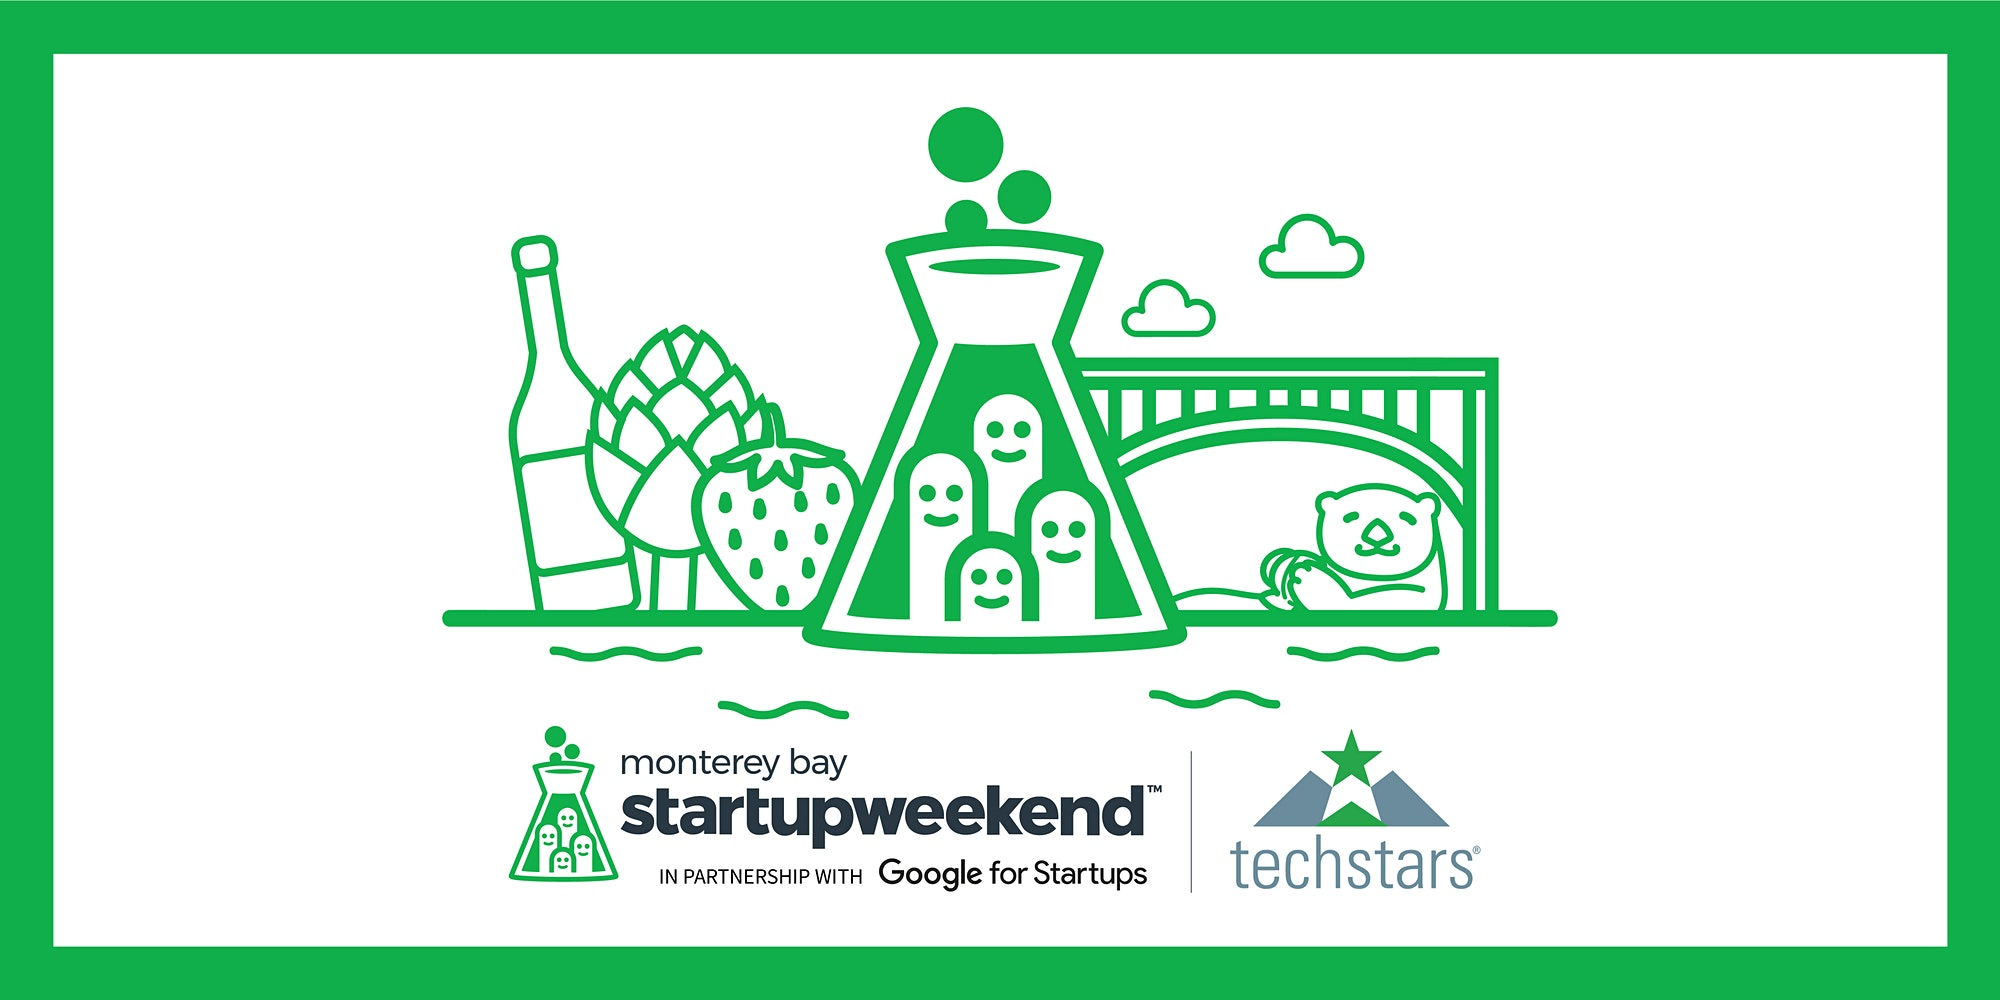 Techstars Startup Weekend Monterey Bay Returns to CSUMB on Feb. 5-7